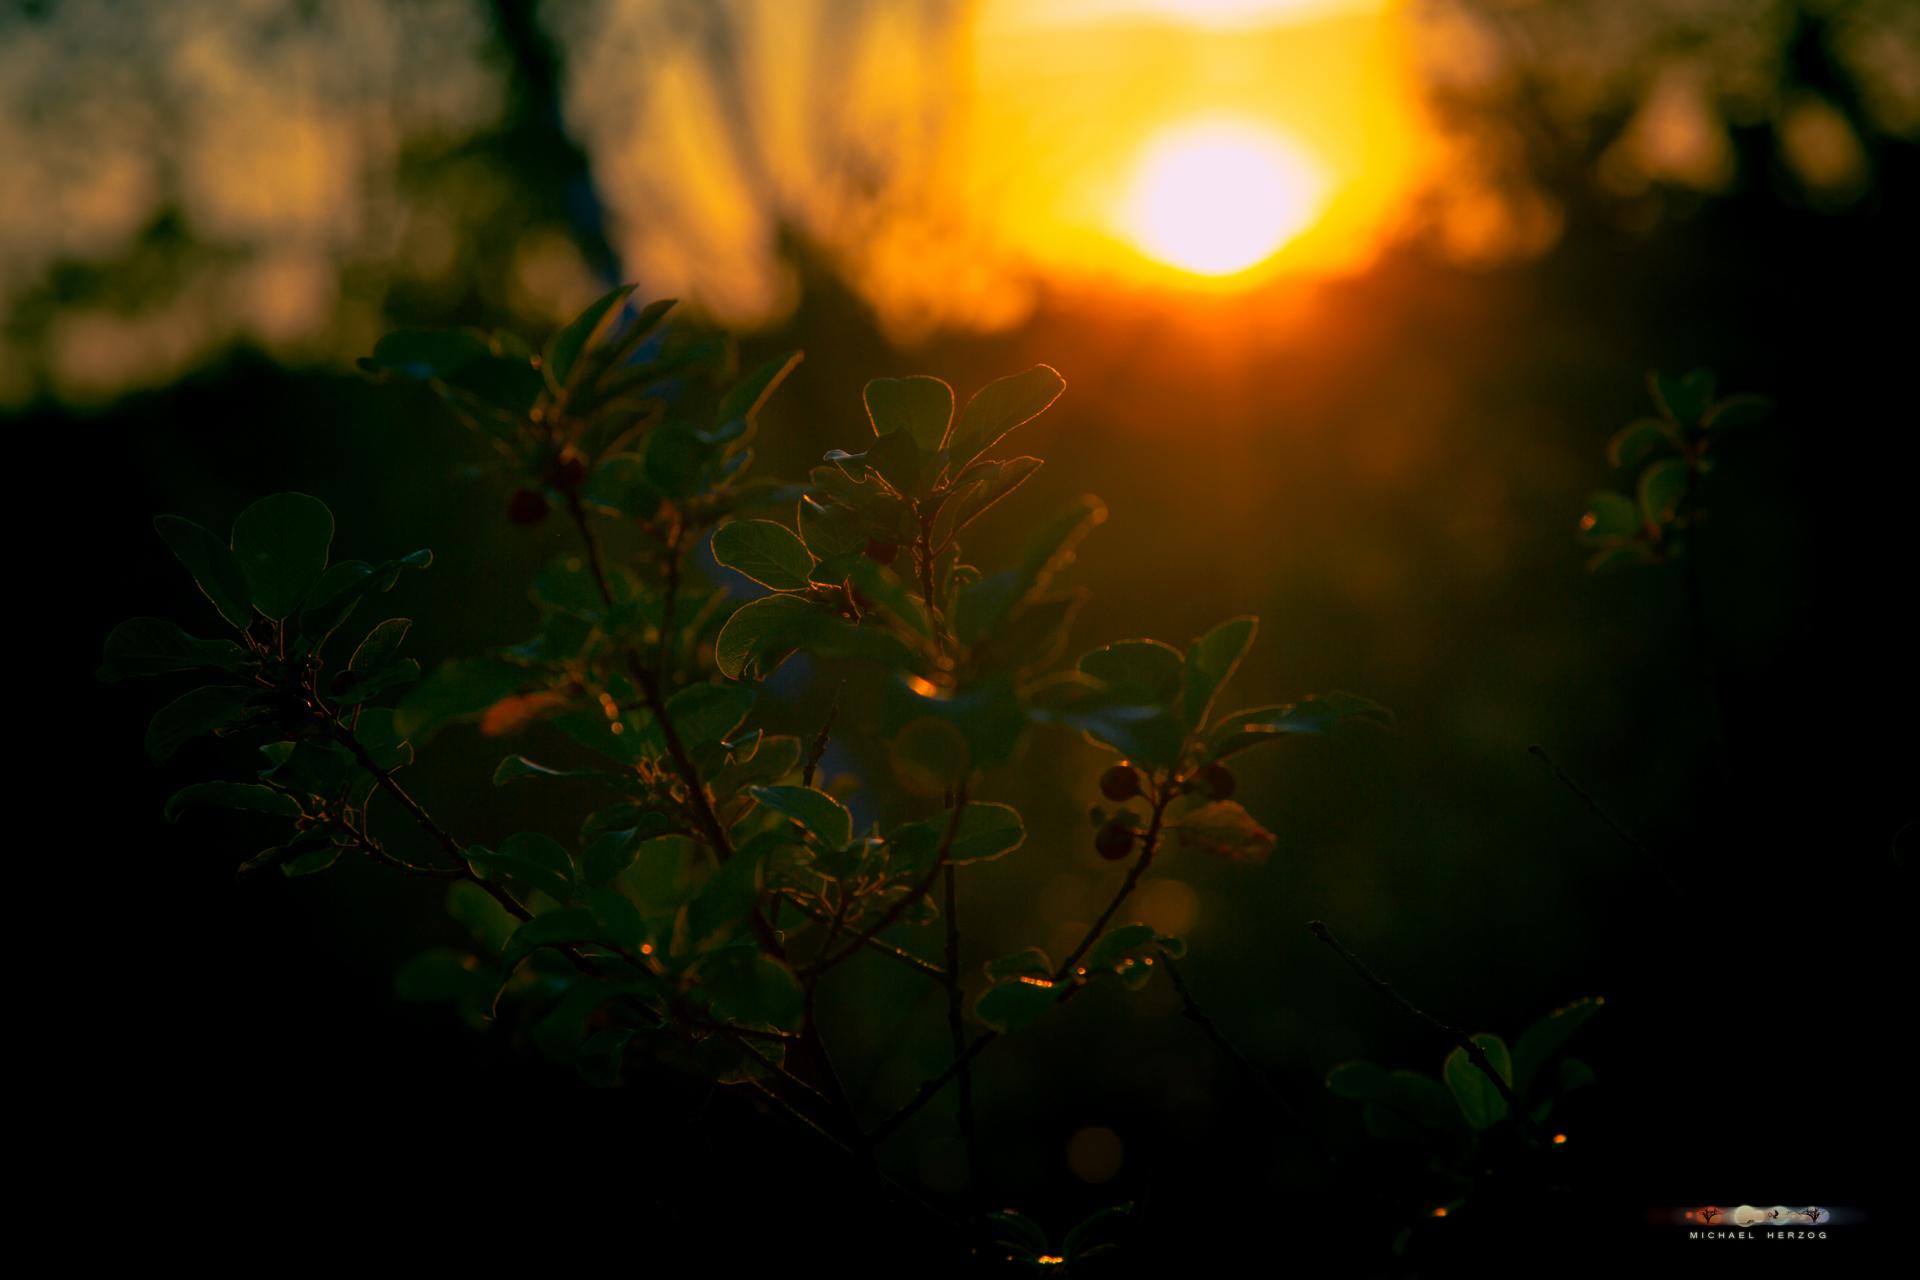 Sonnenuntergang_ibmerMoor_MichaelHerzog.jpg